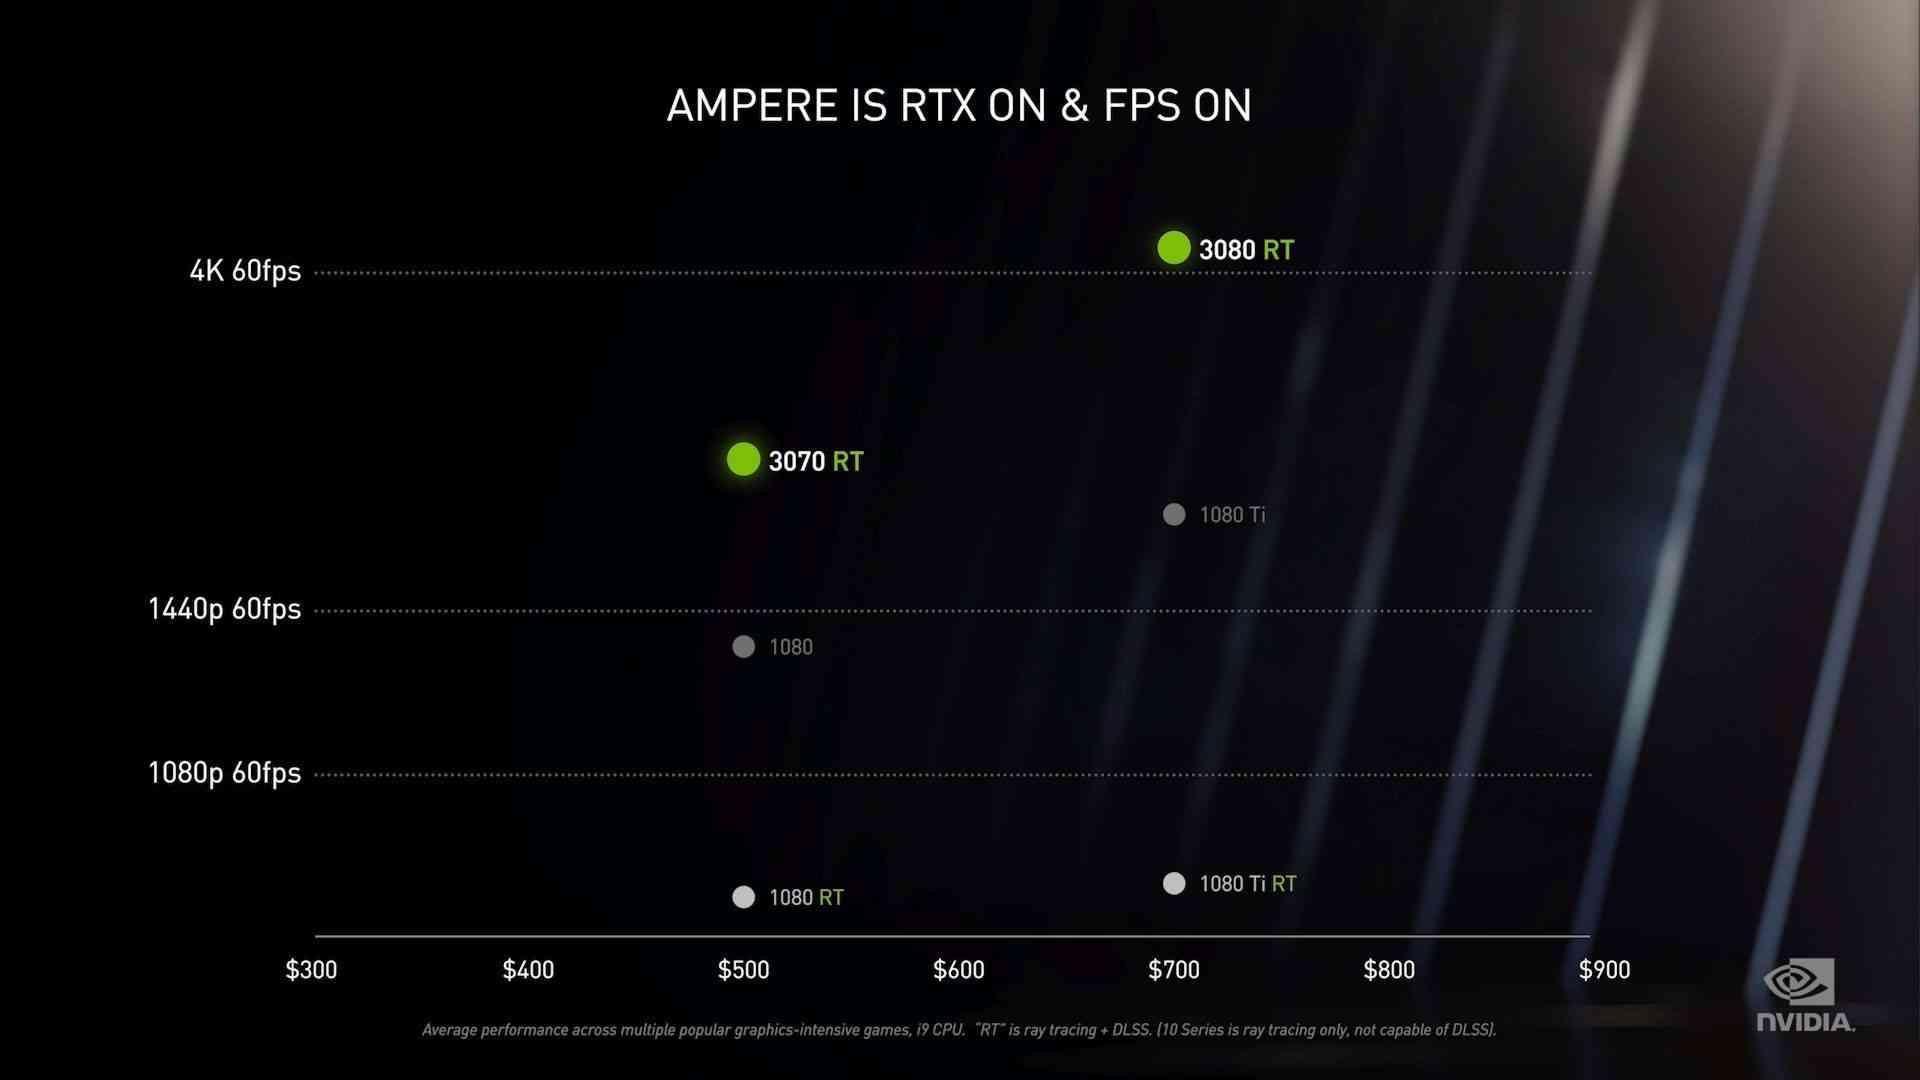 Nvidia RTX 3080, RTX 3070 performance graph.